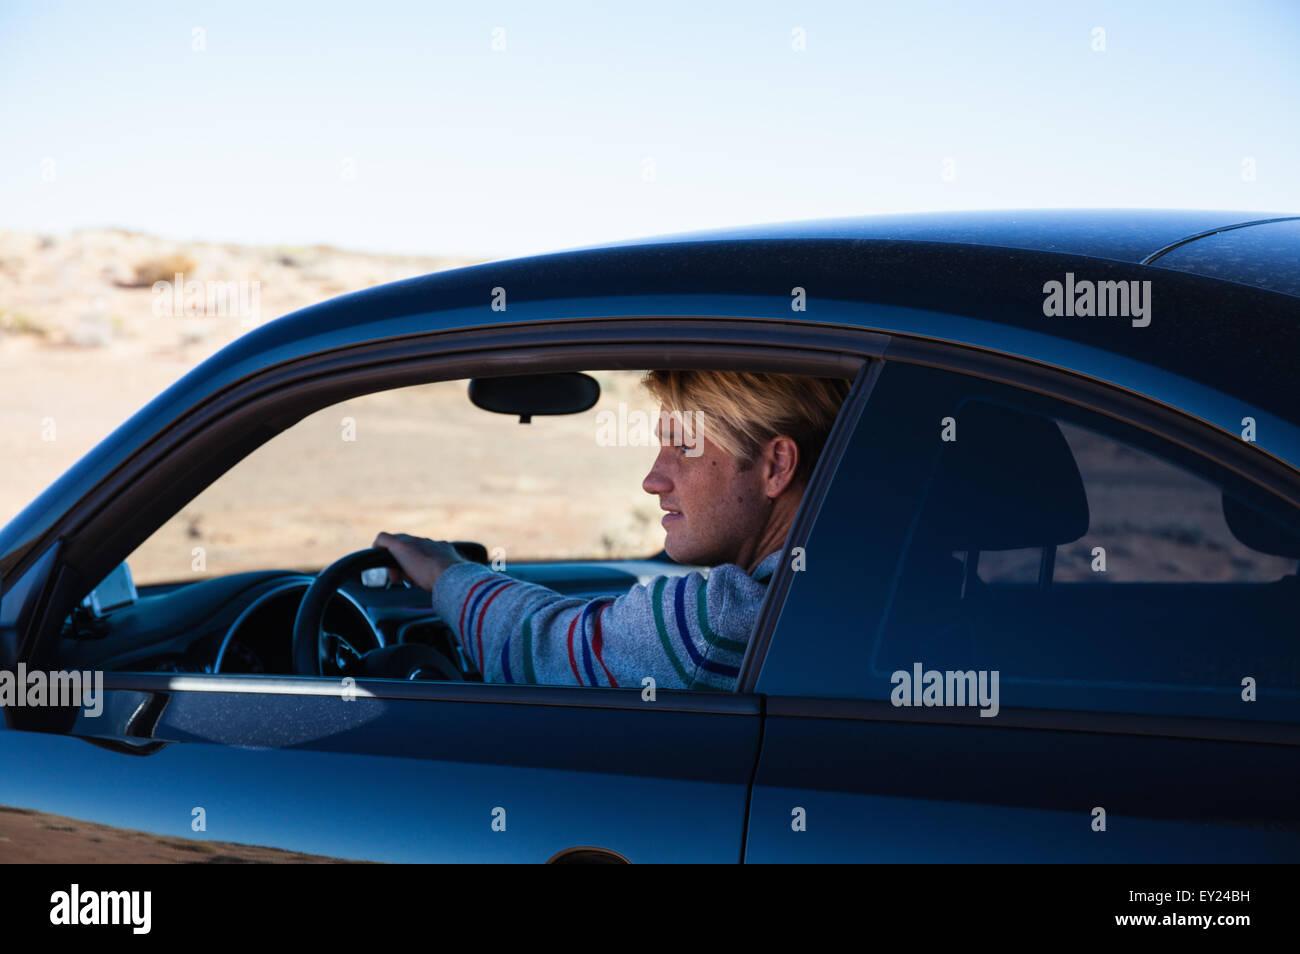 Man driving on road trip, Tuba City, Arizona, USA - Stock Image